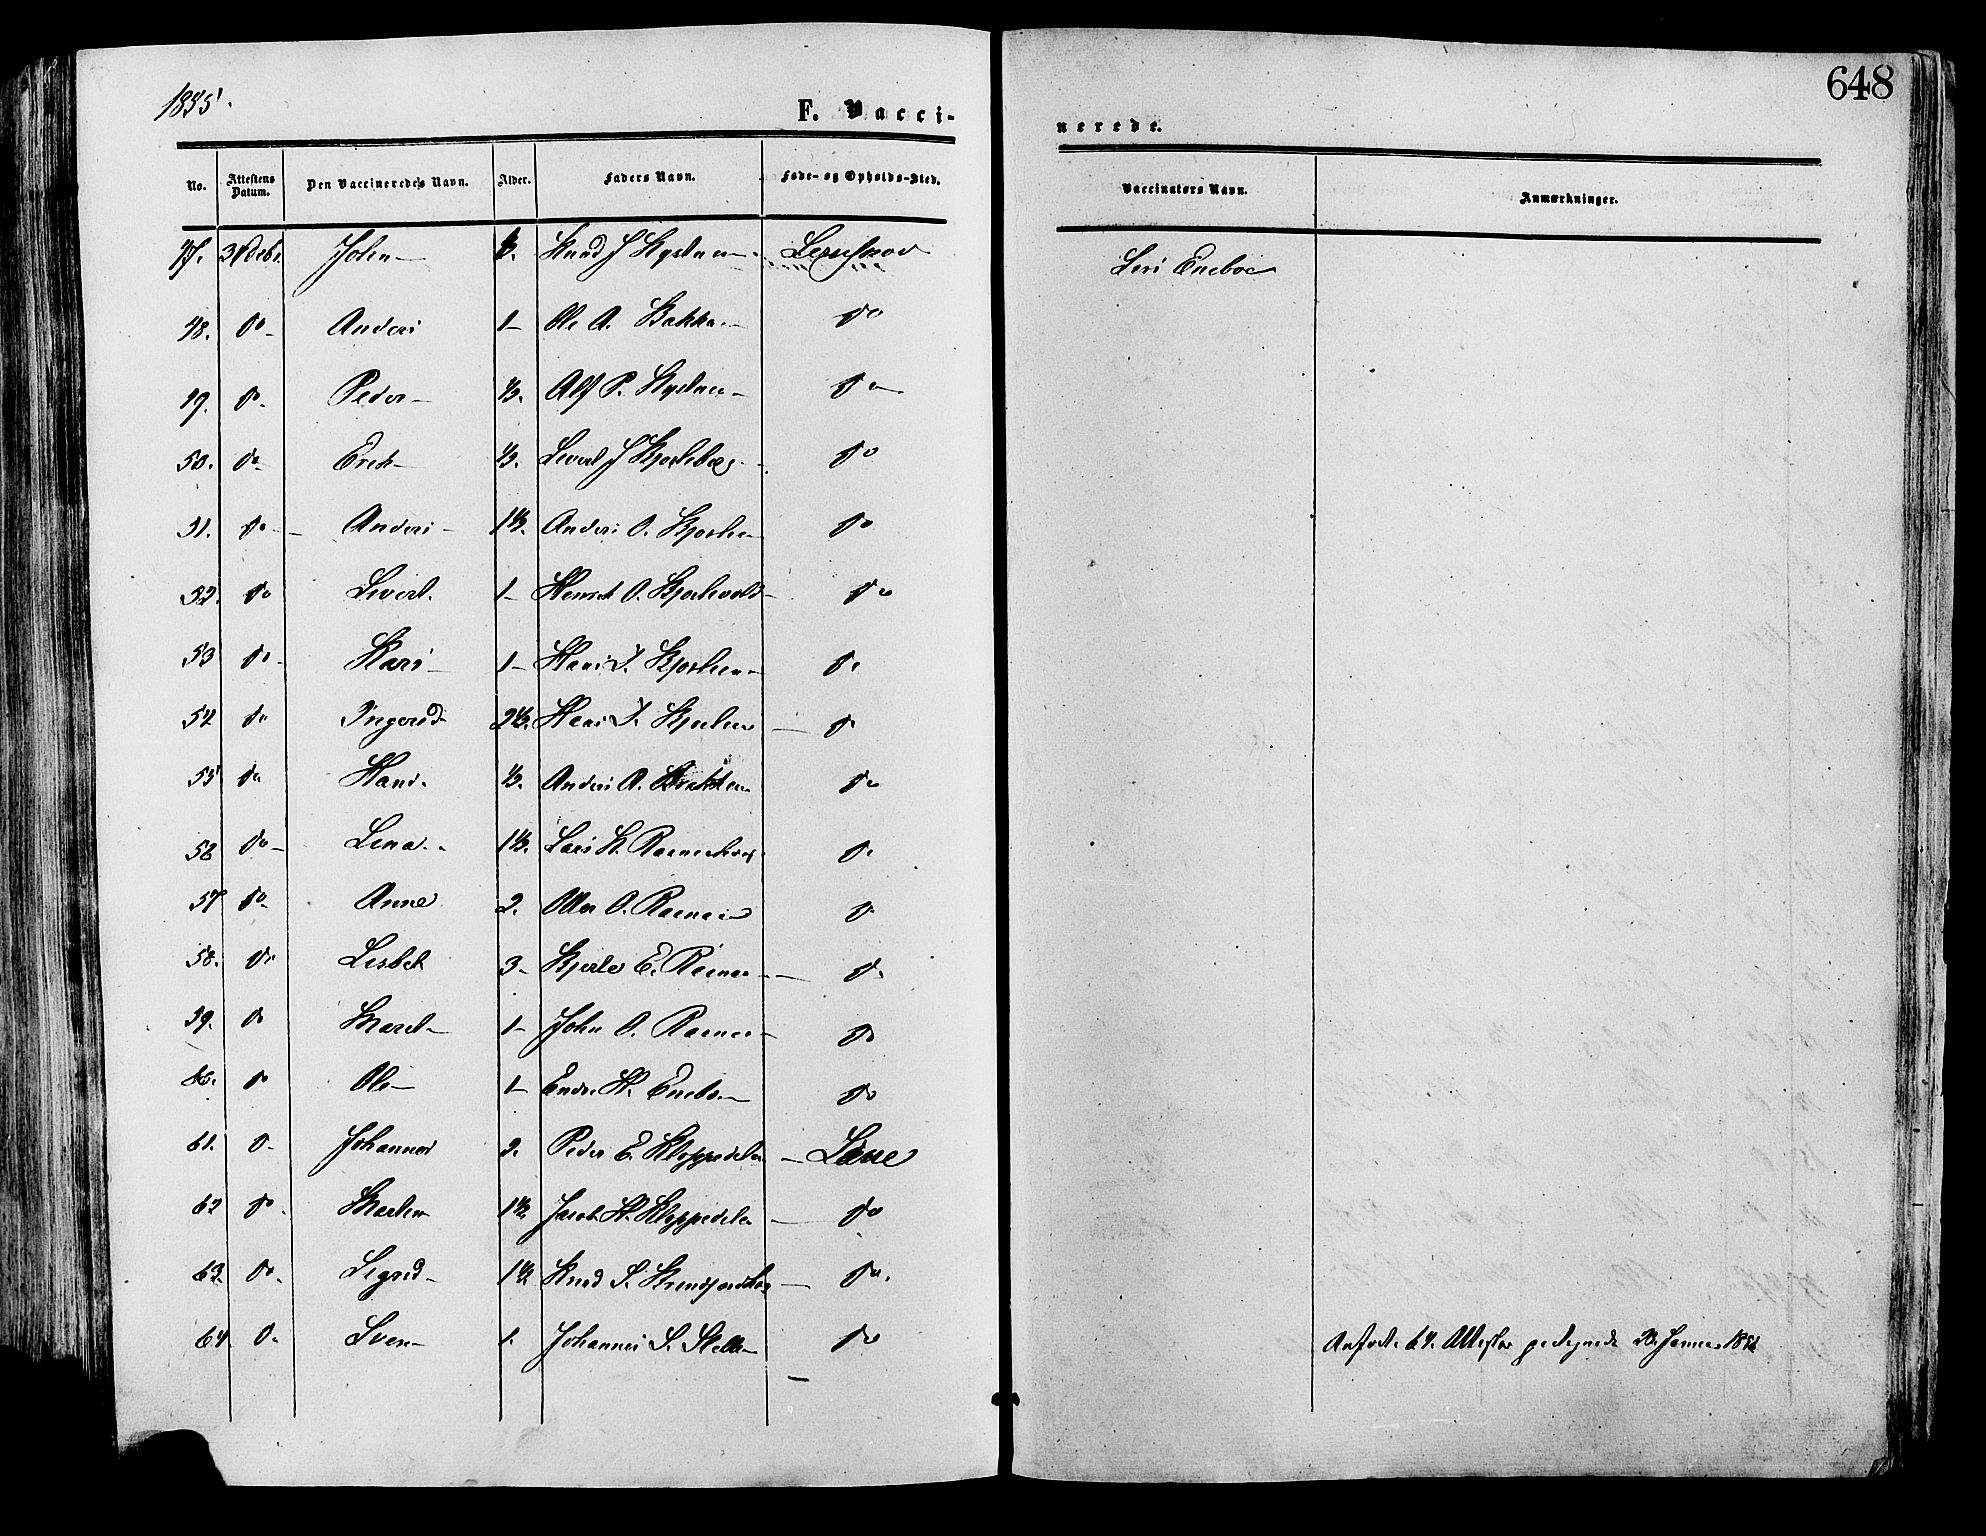 SAH, Lesja prestekontor, Ministerialbok nr. 8, 1854-1880, s. 648